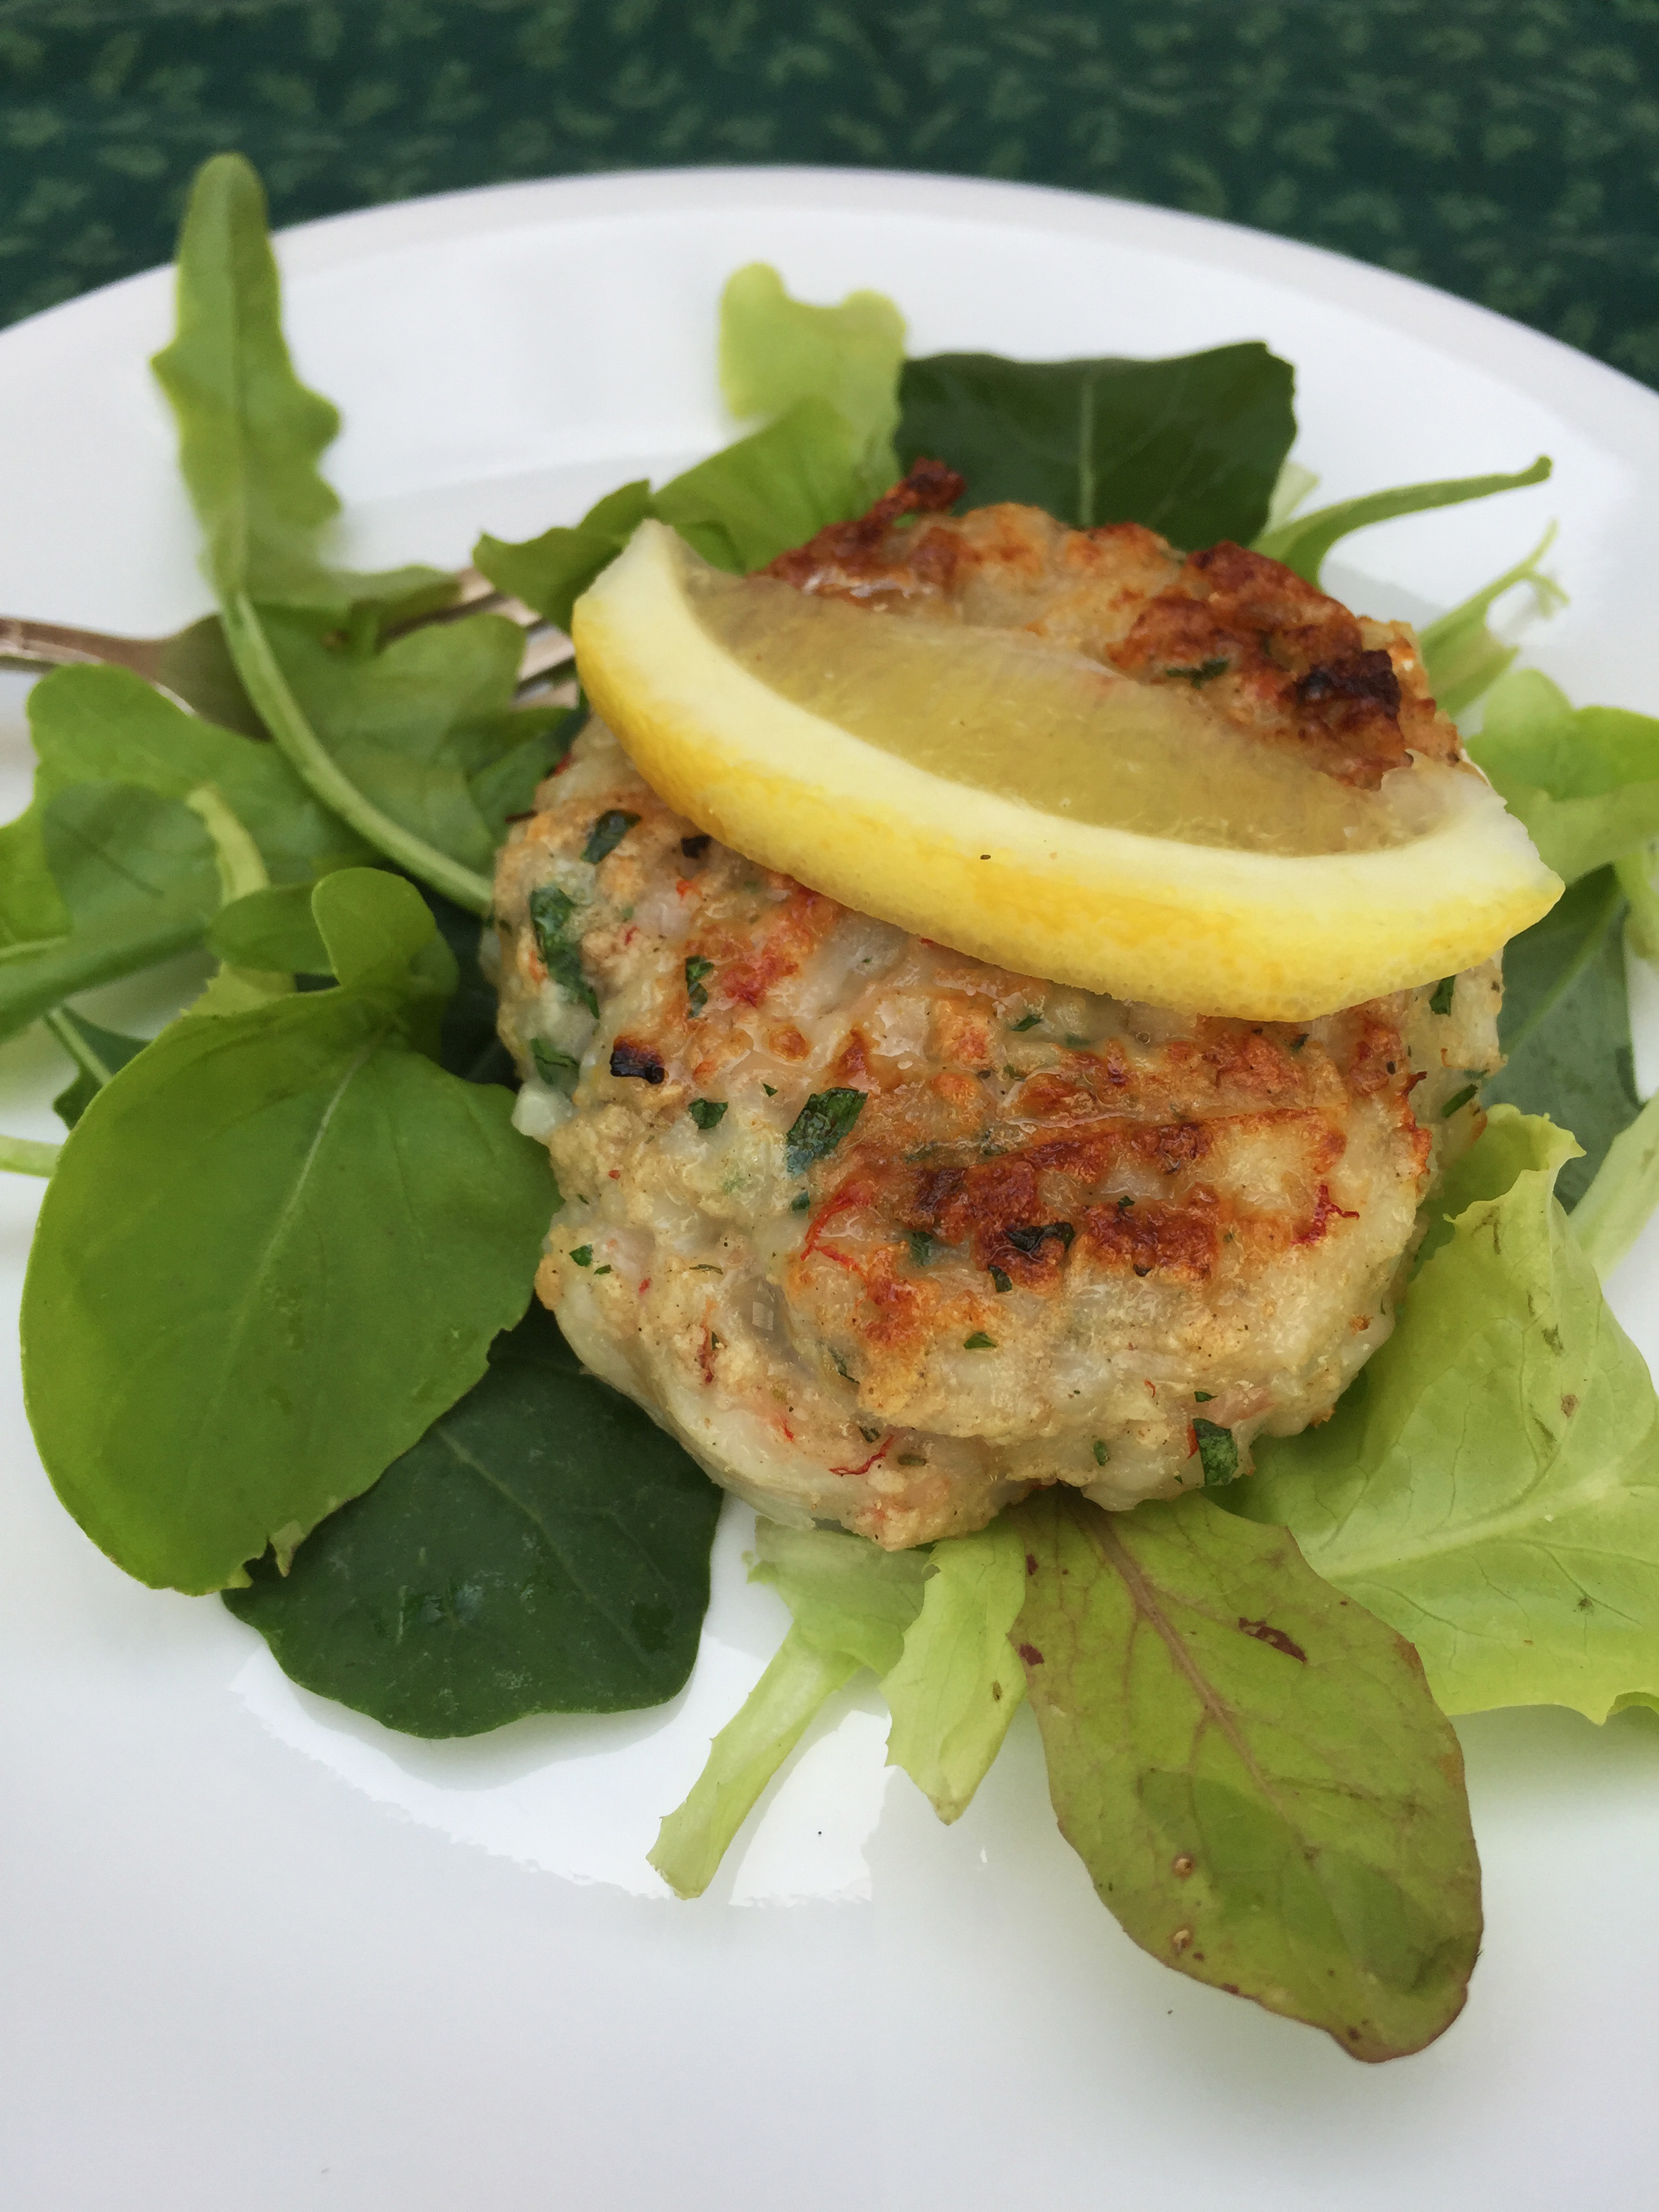 Garlic Herb Seafood Burgers Saladmaster Recipes